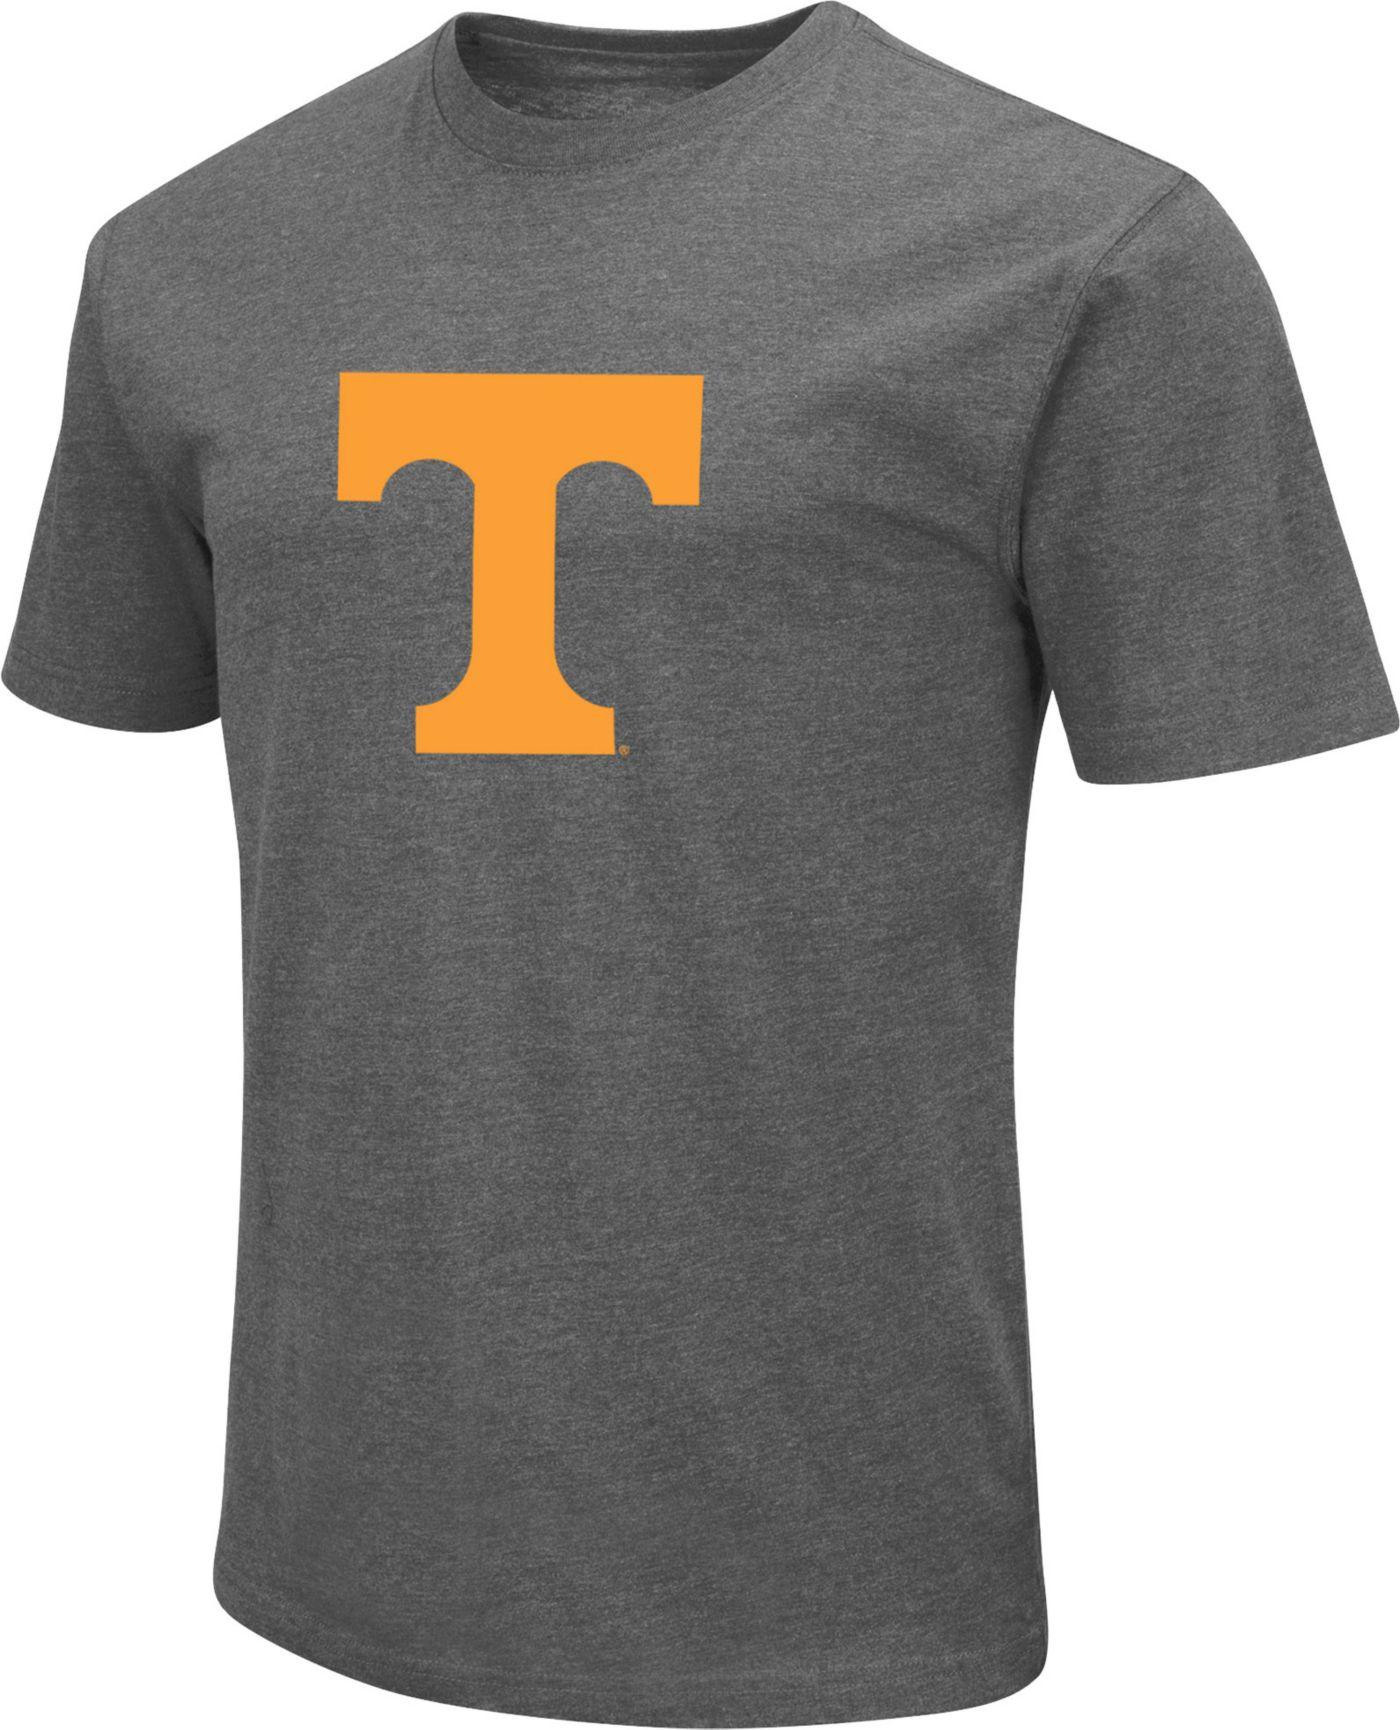 Colosseum Men's Tennessee Volunteers Grey Dual Blend T-Shirt